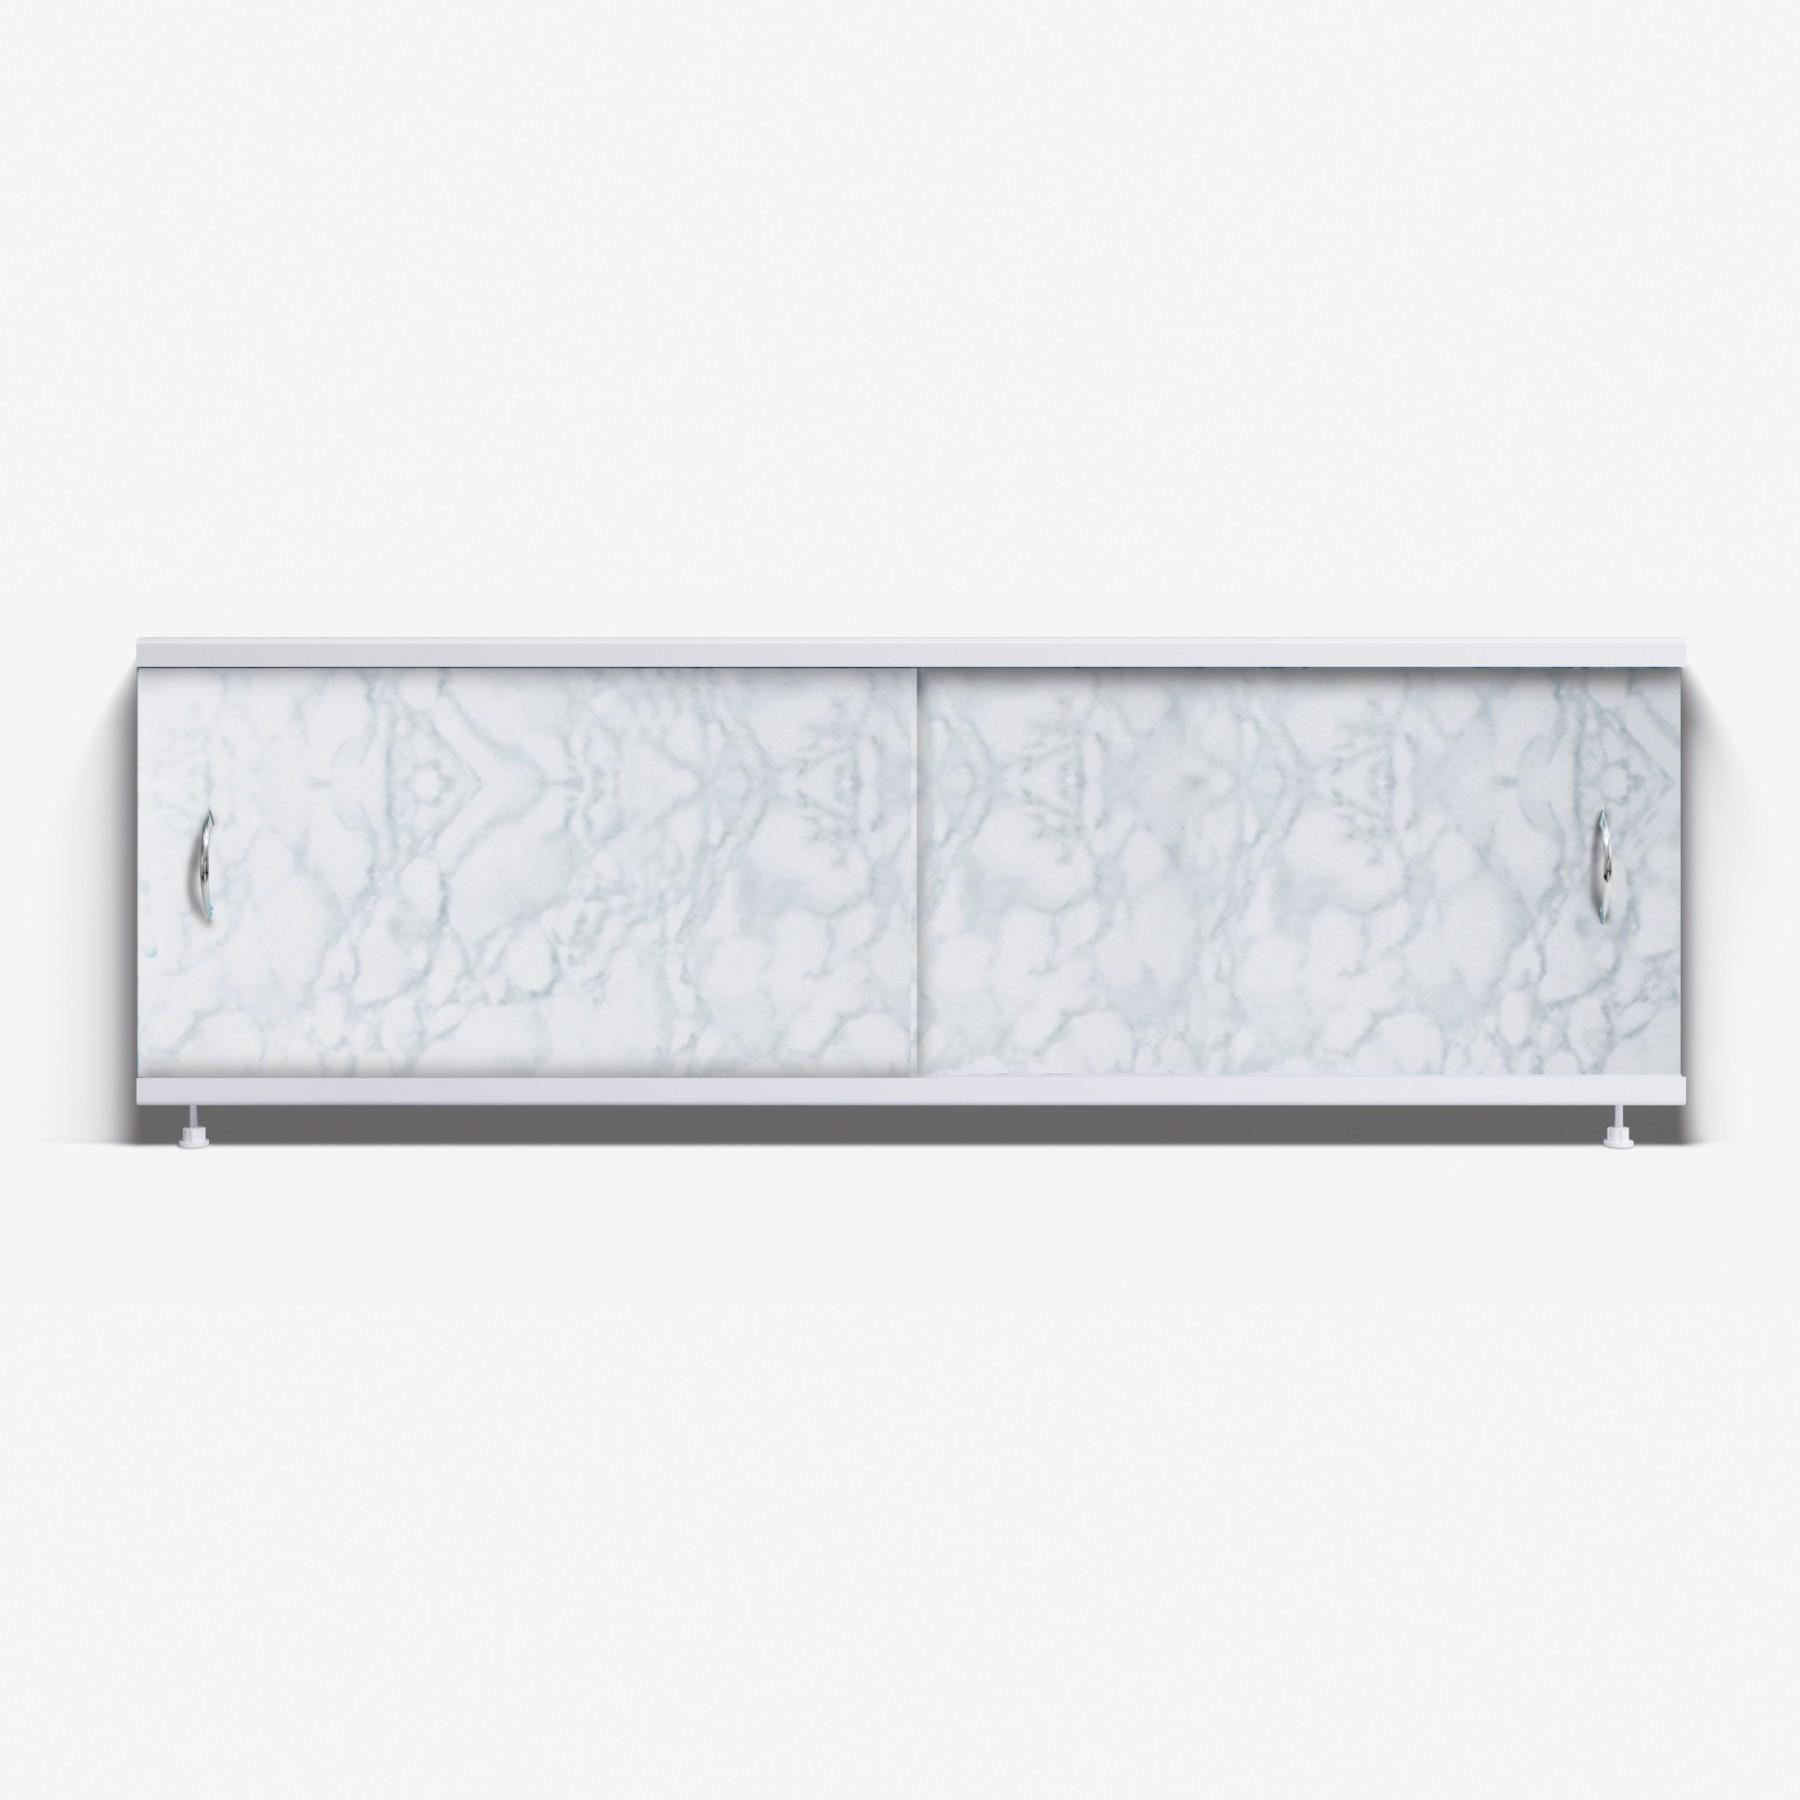 Экран под ванну Классик 170 светло-серый мрамор